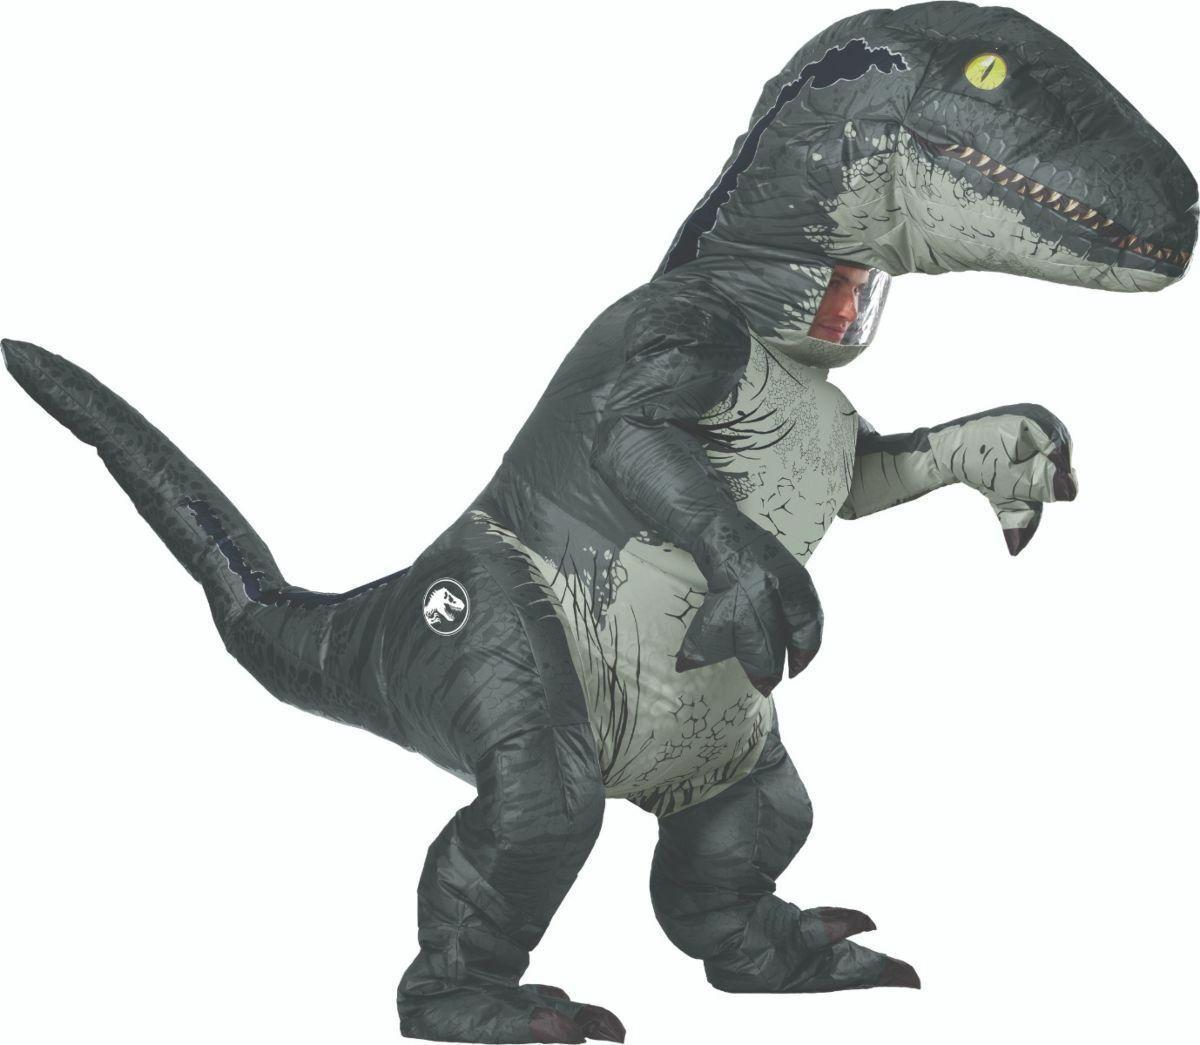 Rubini Jurassic World Velociraptor Gonfiabile Adulto Costume Halloween 820883